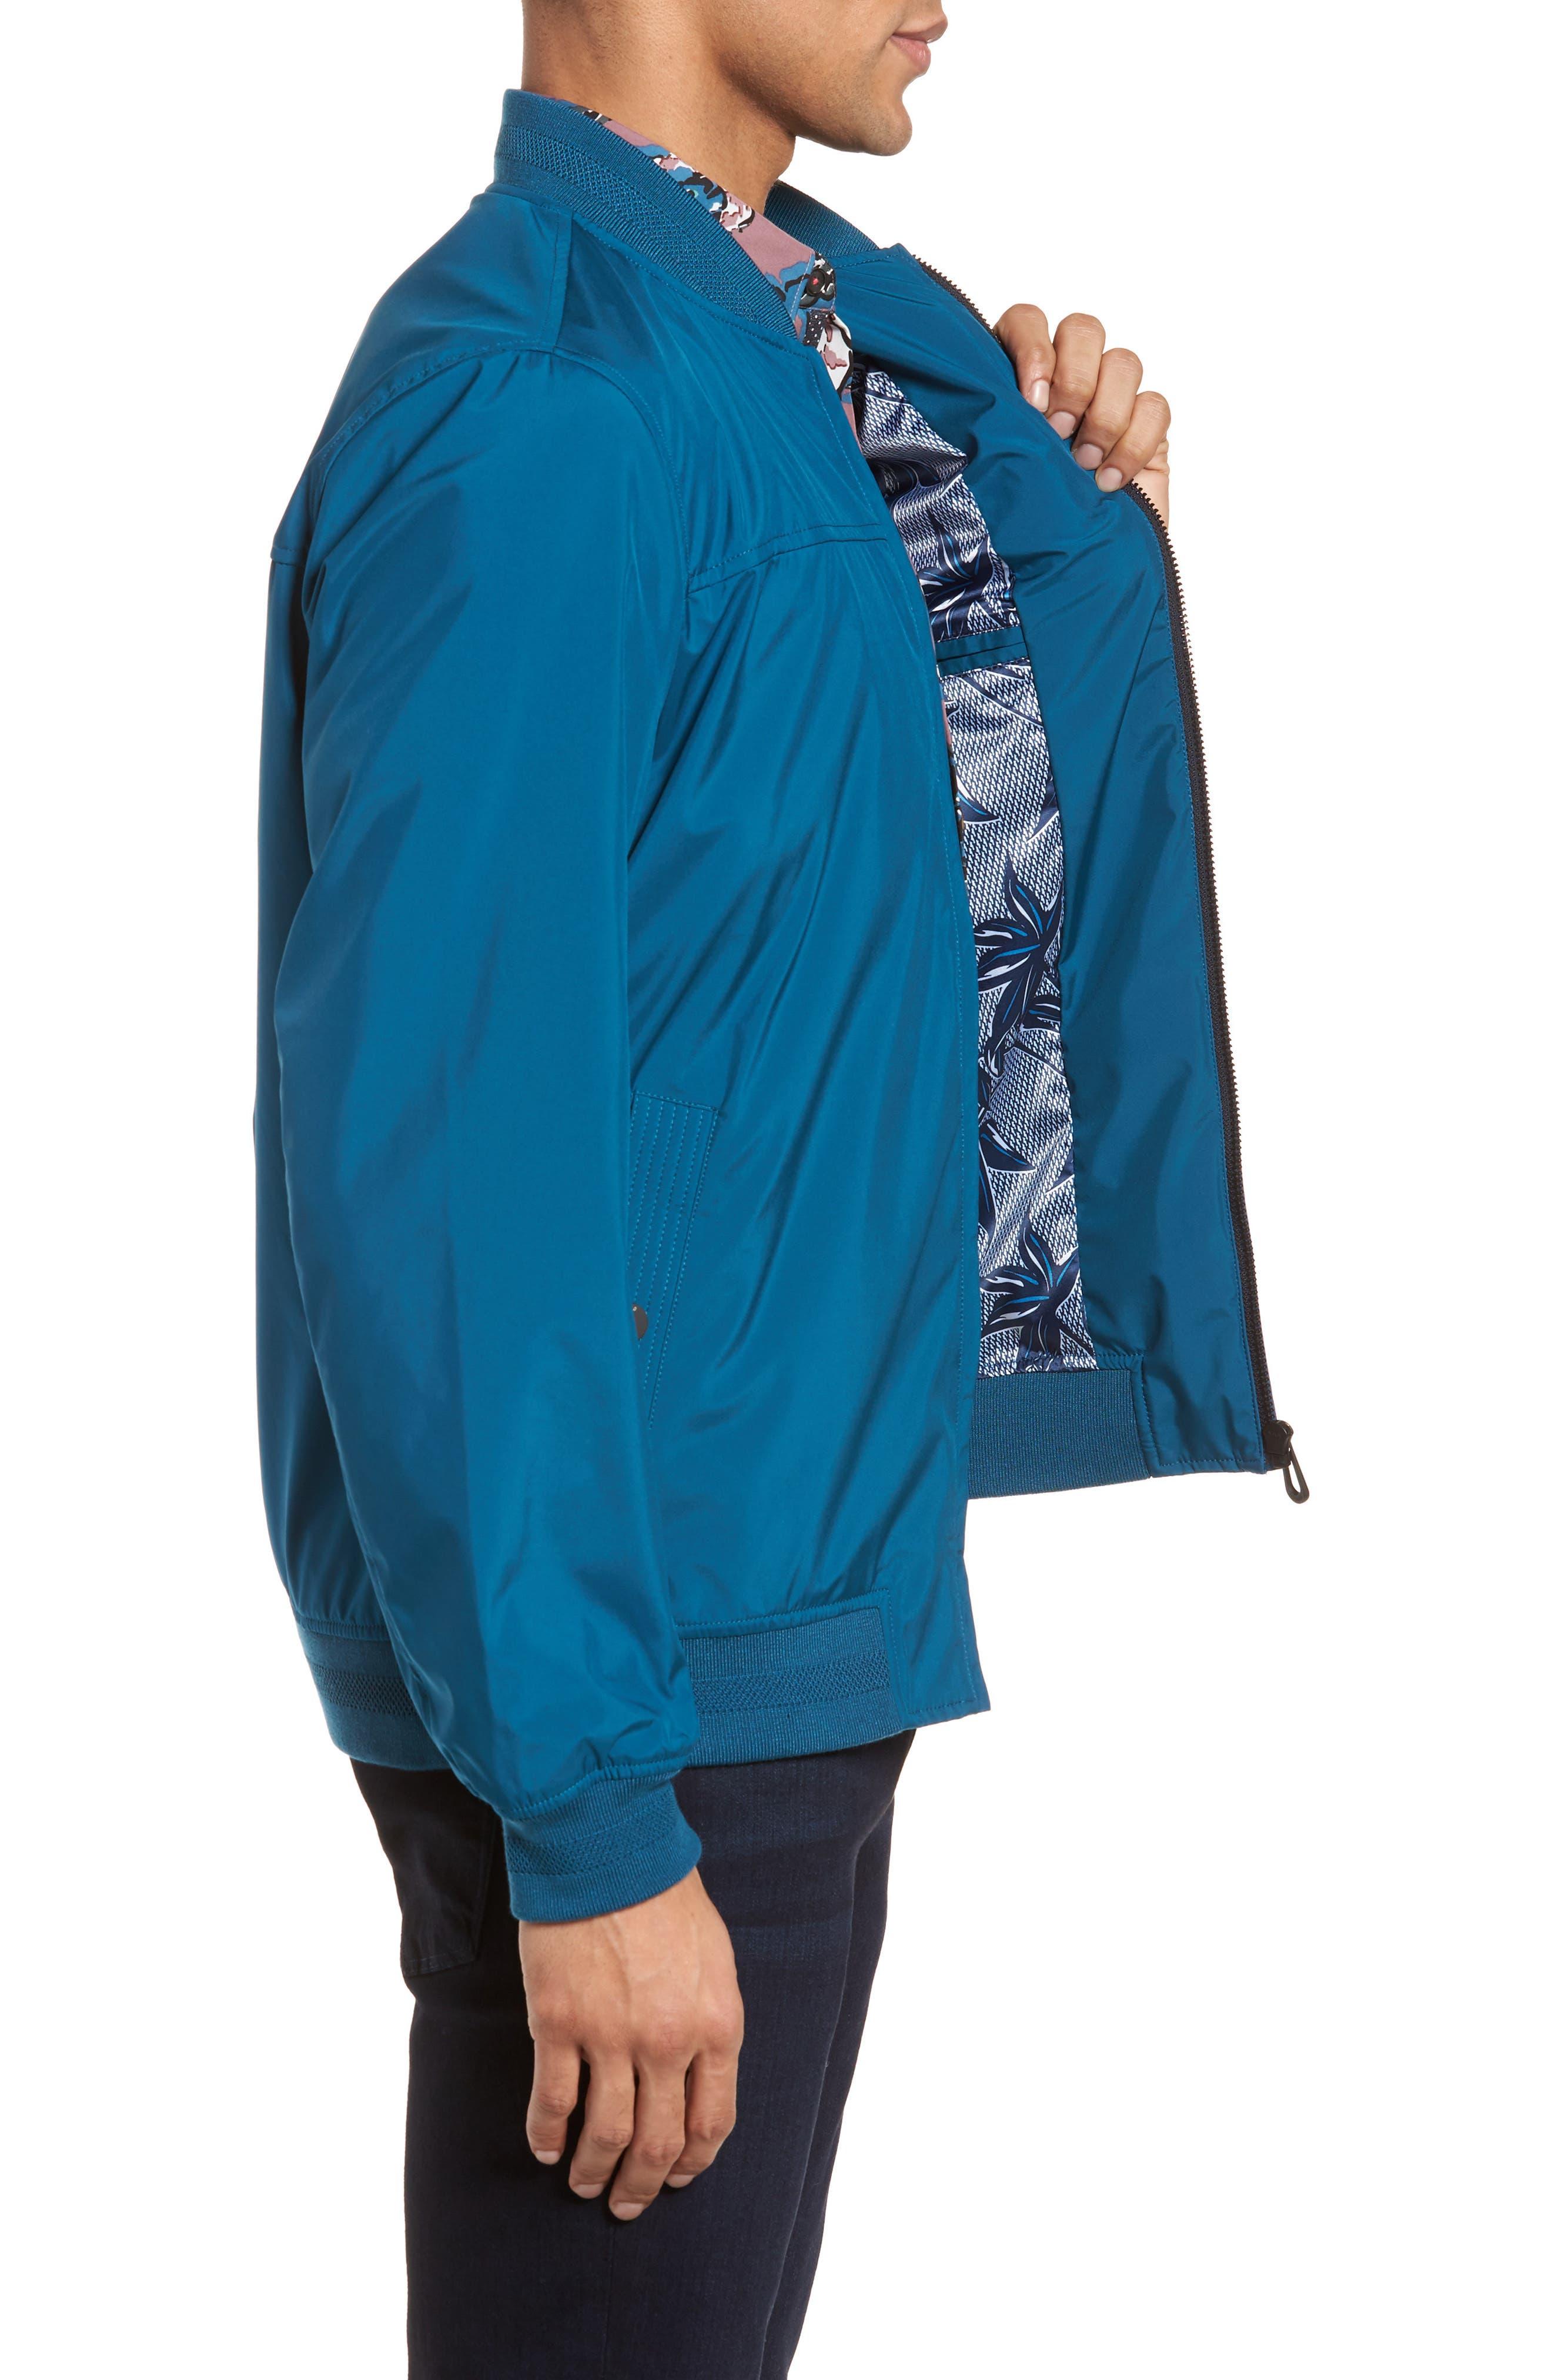 Ohta Bomber Jacket,                             Alternate thumbnail 3, color,                             Teal